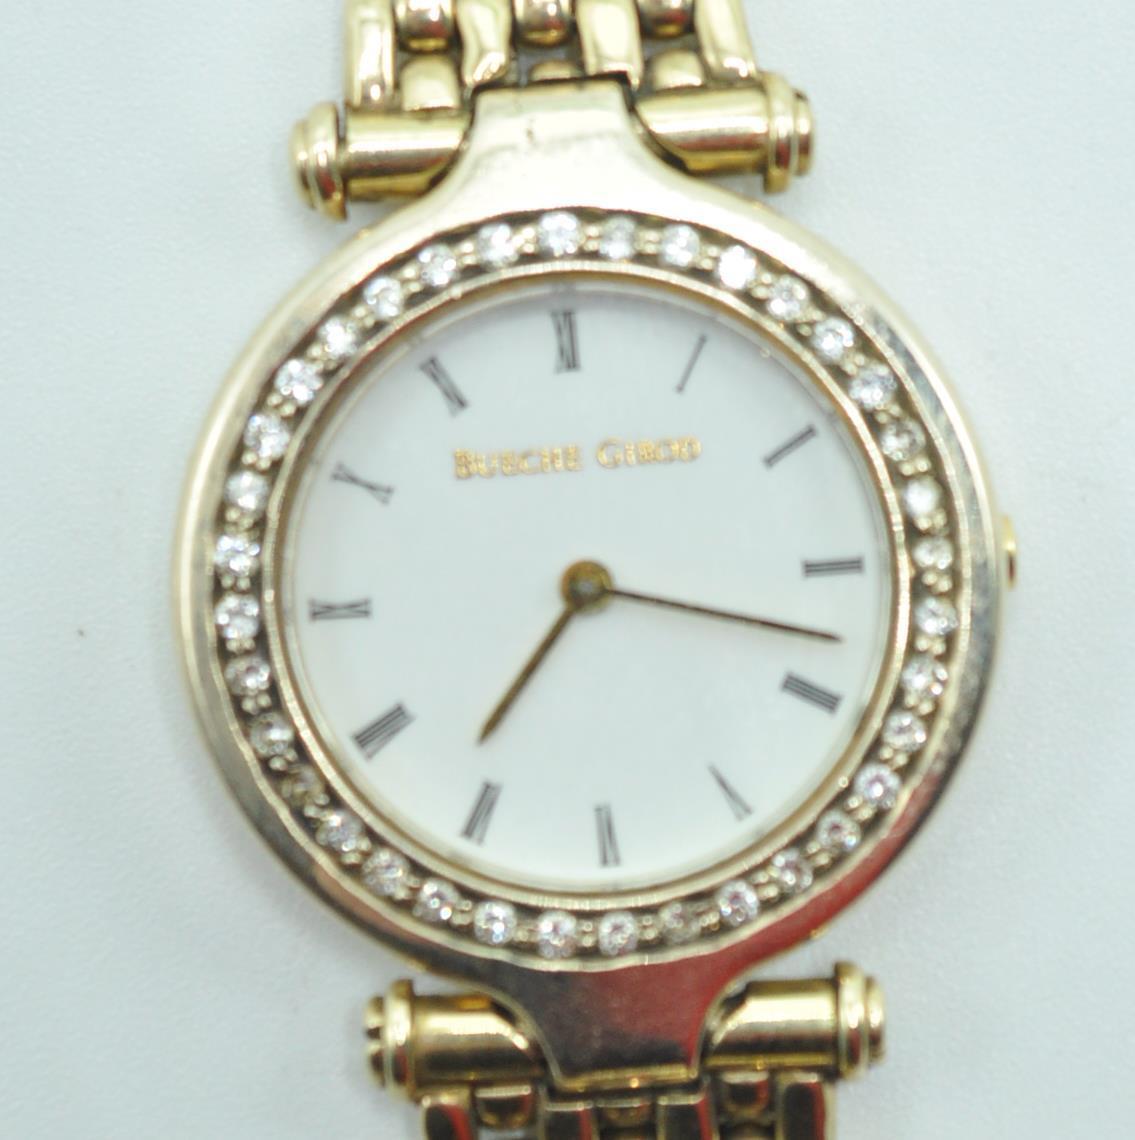 BUECHE GIROD 9CT GOLD AND DIAMOND WRIST WATCH - Image 2 of 8